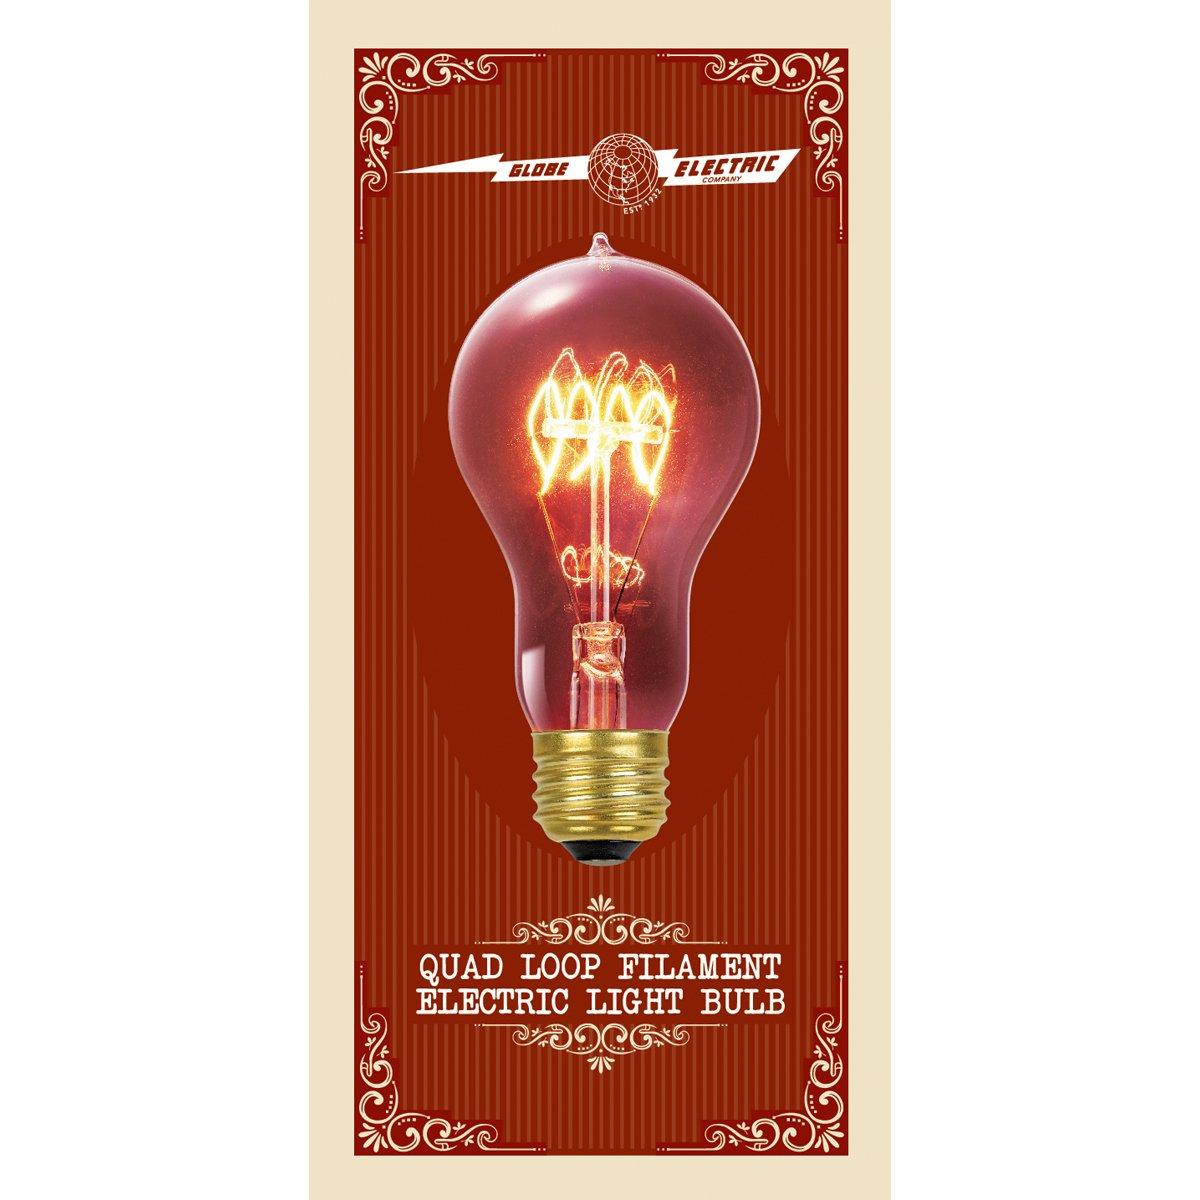 Globe Electric 60W Vintage Edison A19 Quad Loop Incandescent Filament Light  Bulb, E26 Base, 01325     Amazon.com